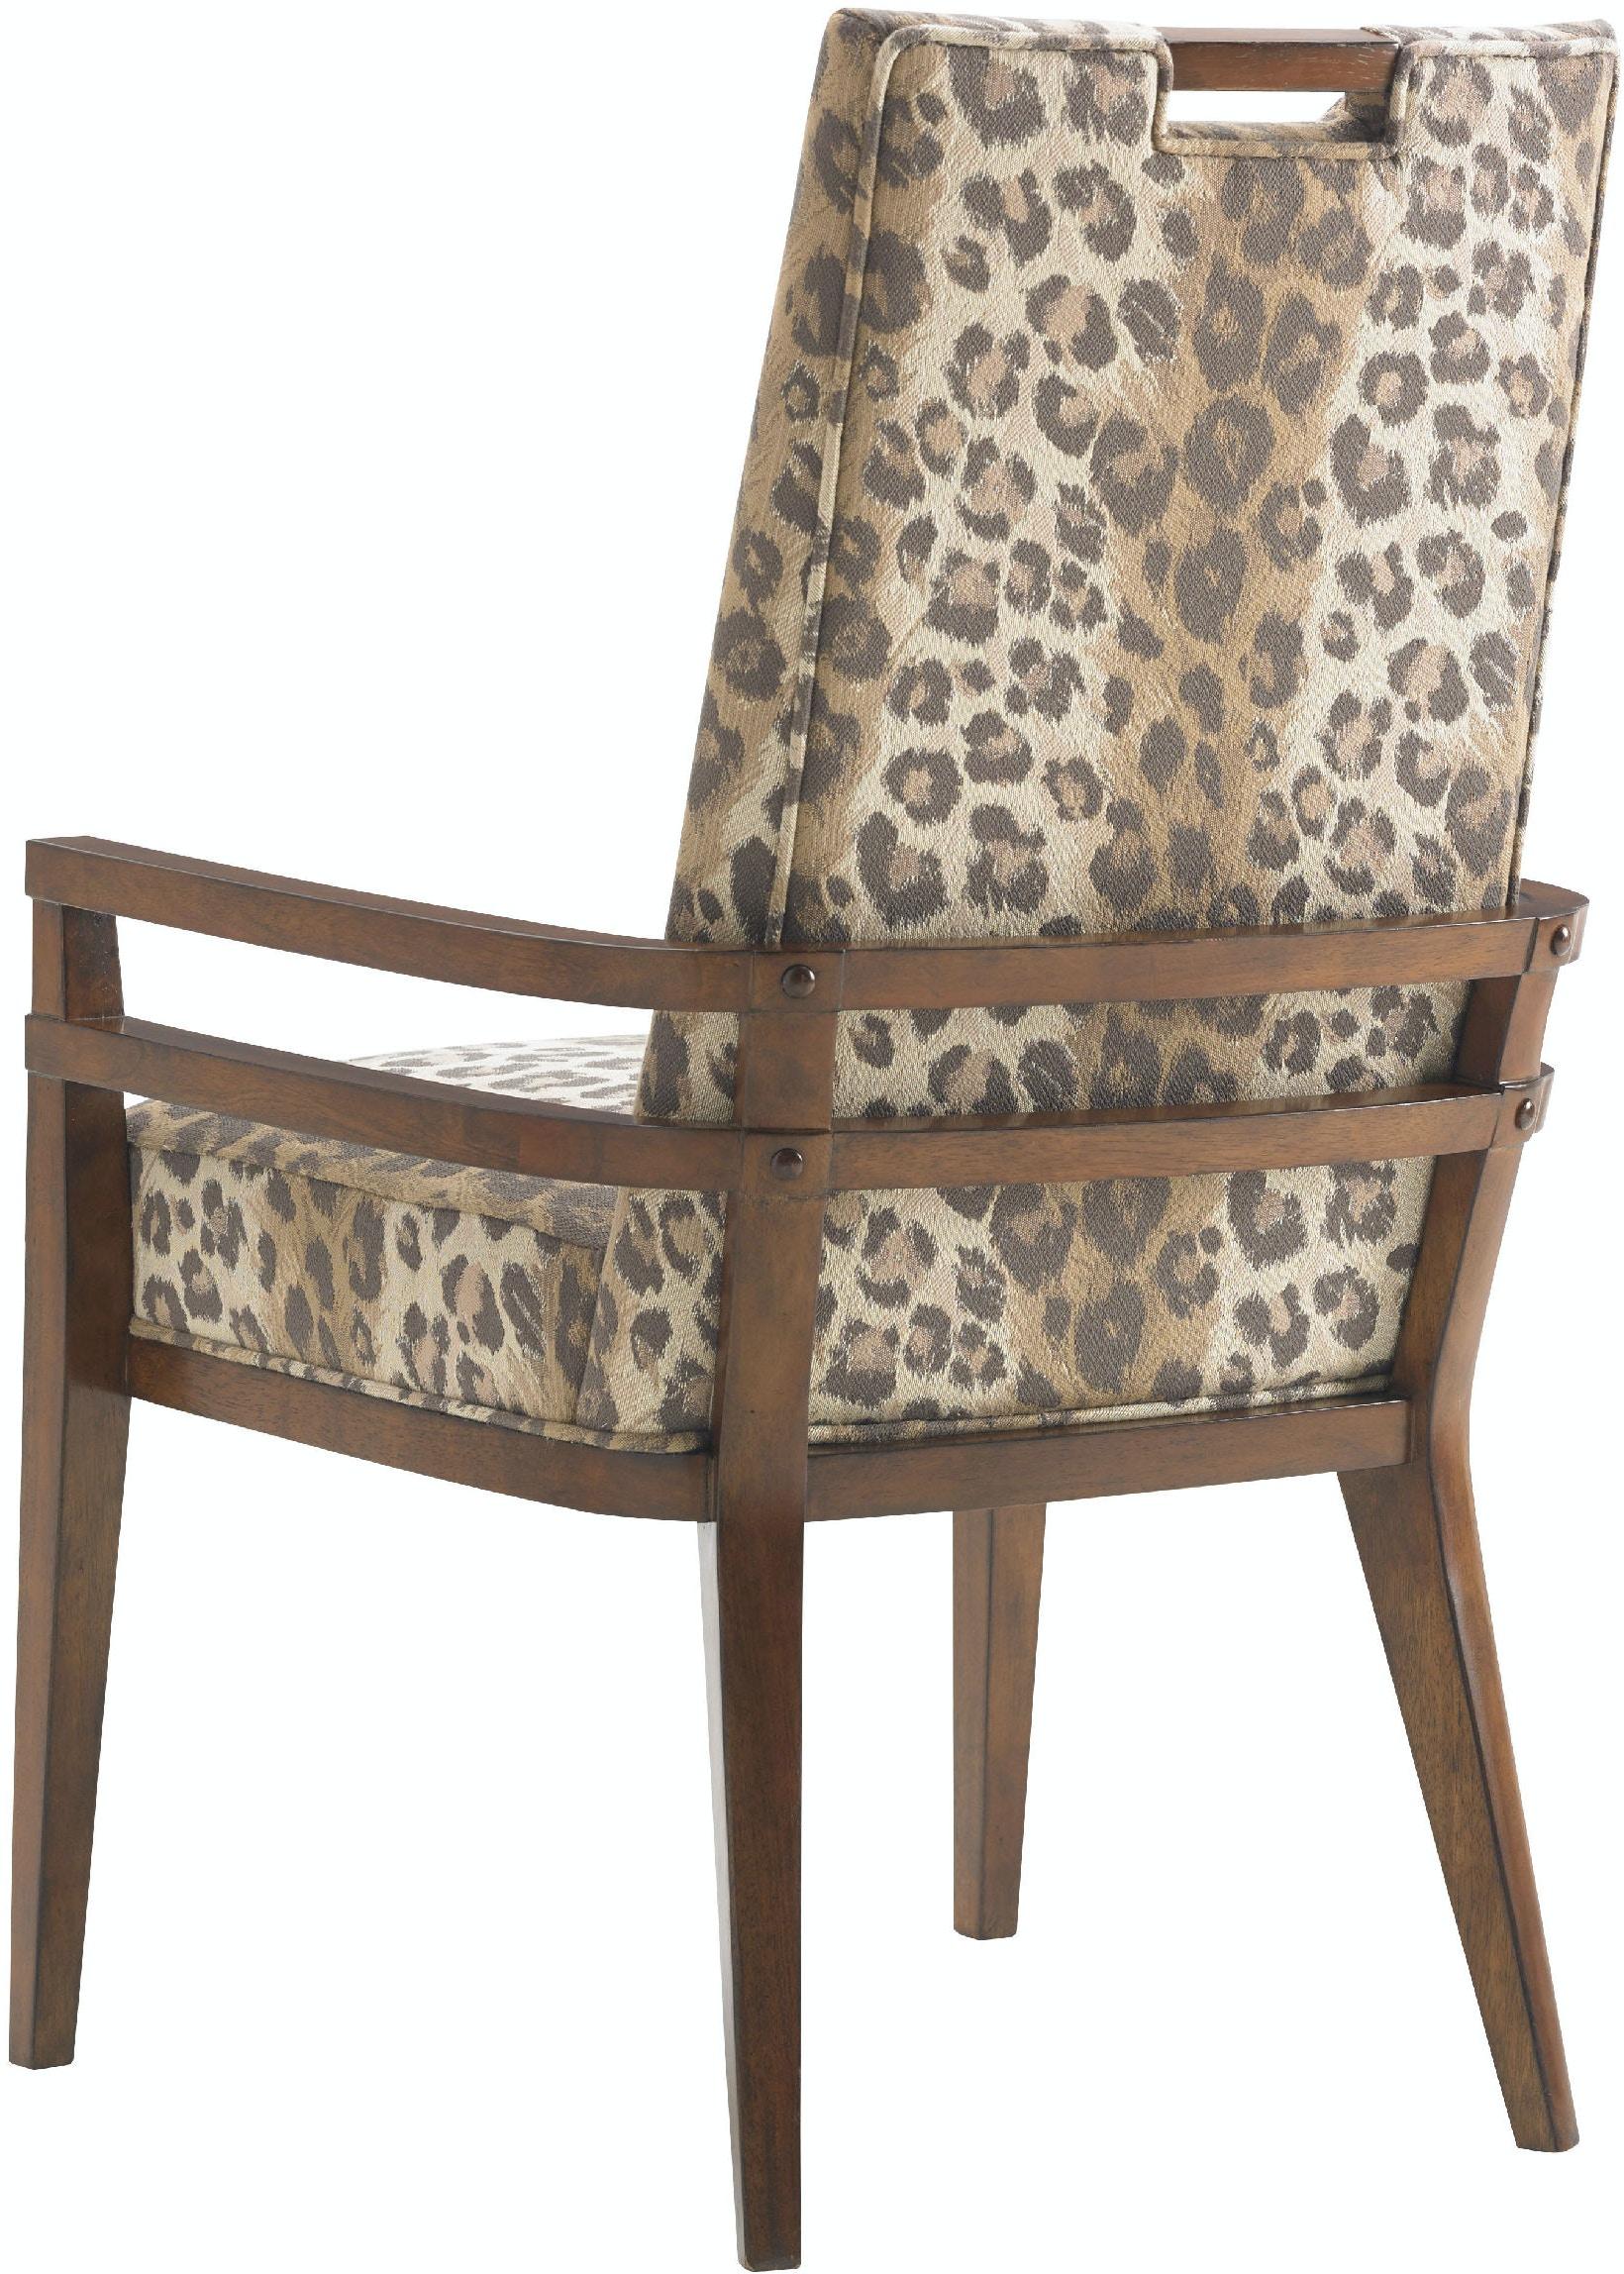 Coles Bay Arm Chair LX